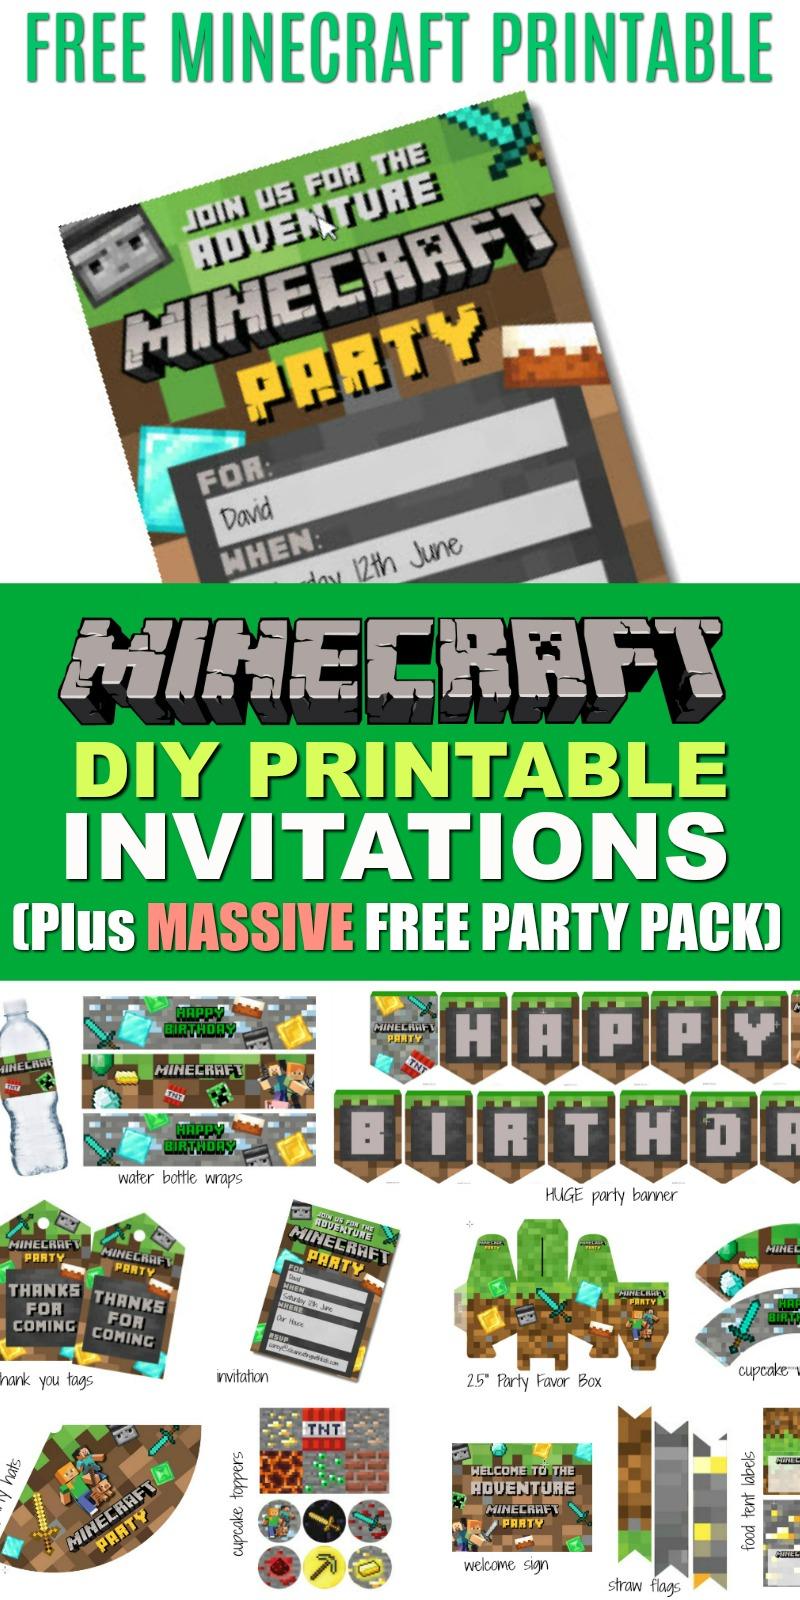 Free Diy Printable Minecraft Birthday Invitation - Clean Eating With - Free Printable Minecraft Birthday Party Invitations Templates